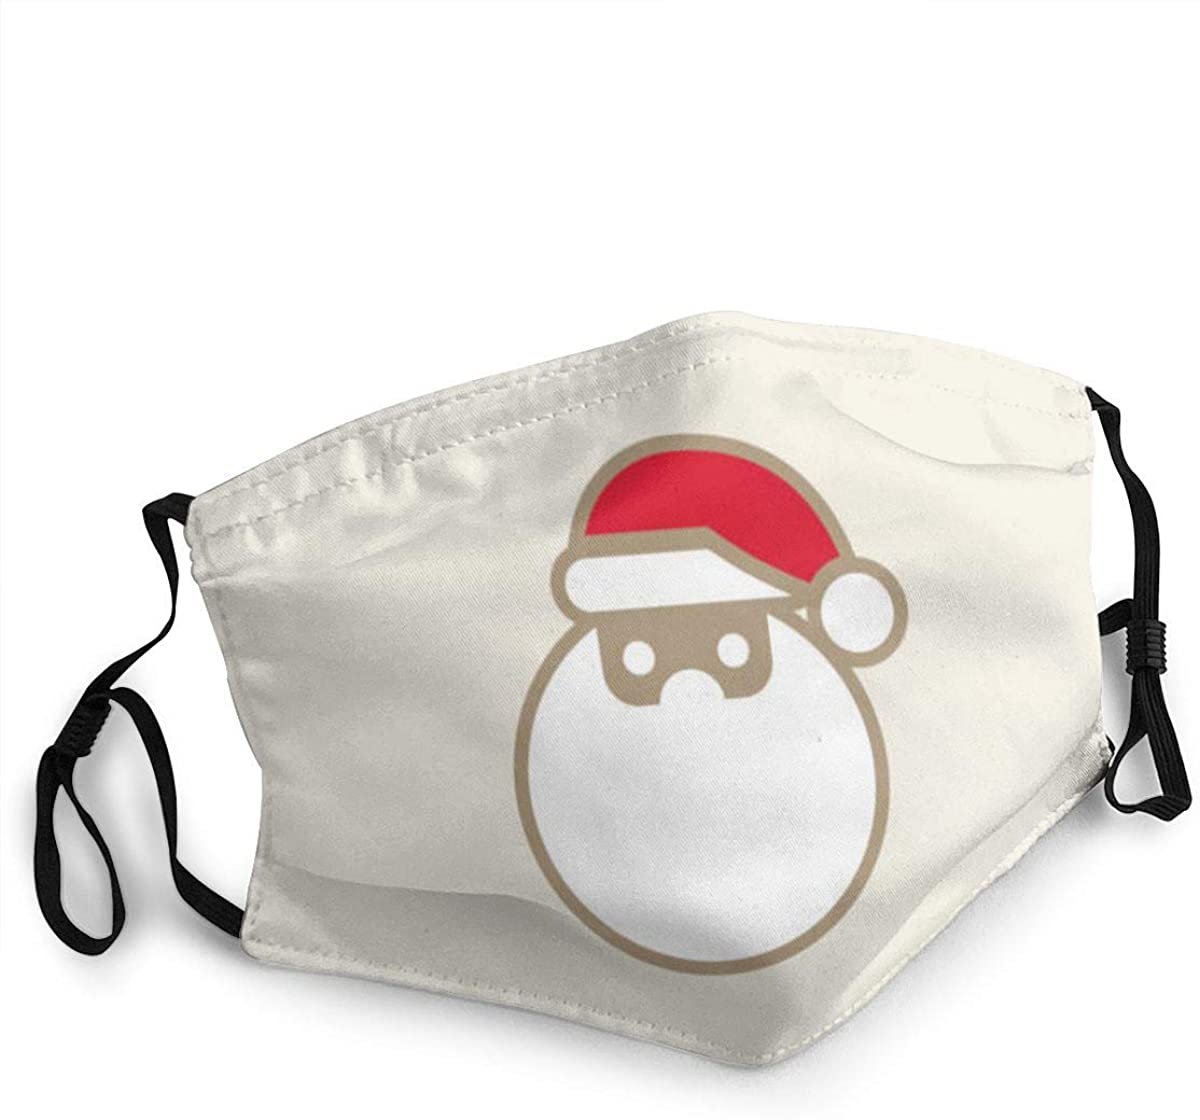 Fashion Protective Face Masks, Santa Claus Unisex Dust Mouth Masks, Washable, Reusable Masks